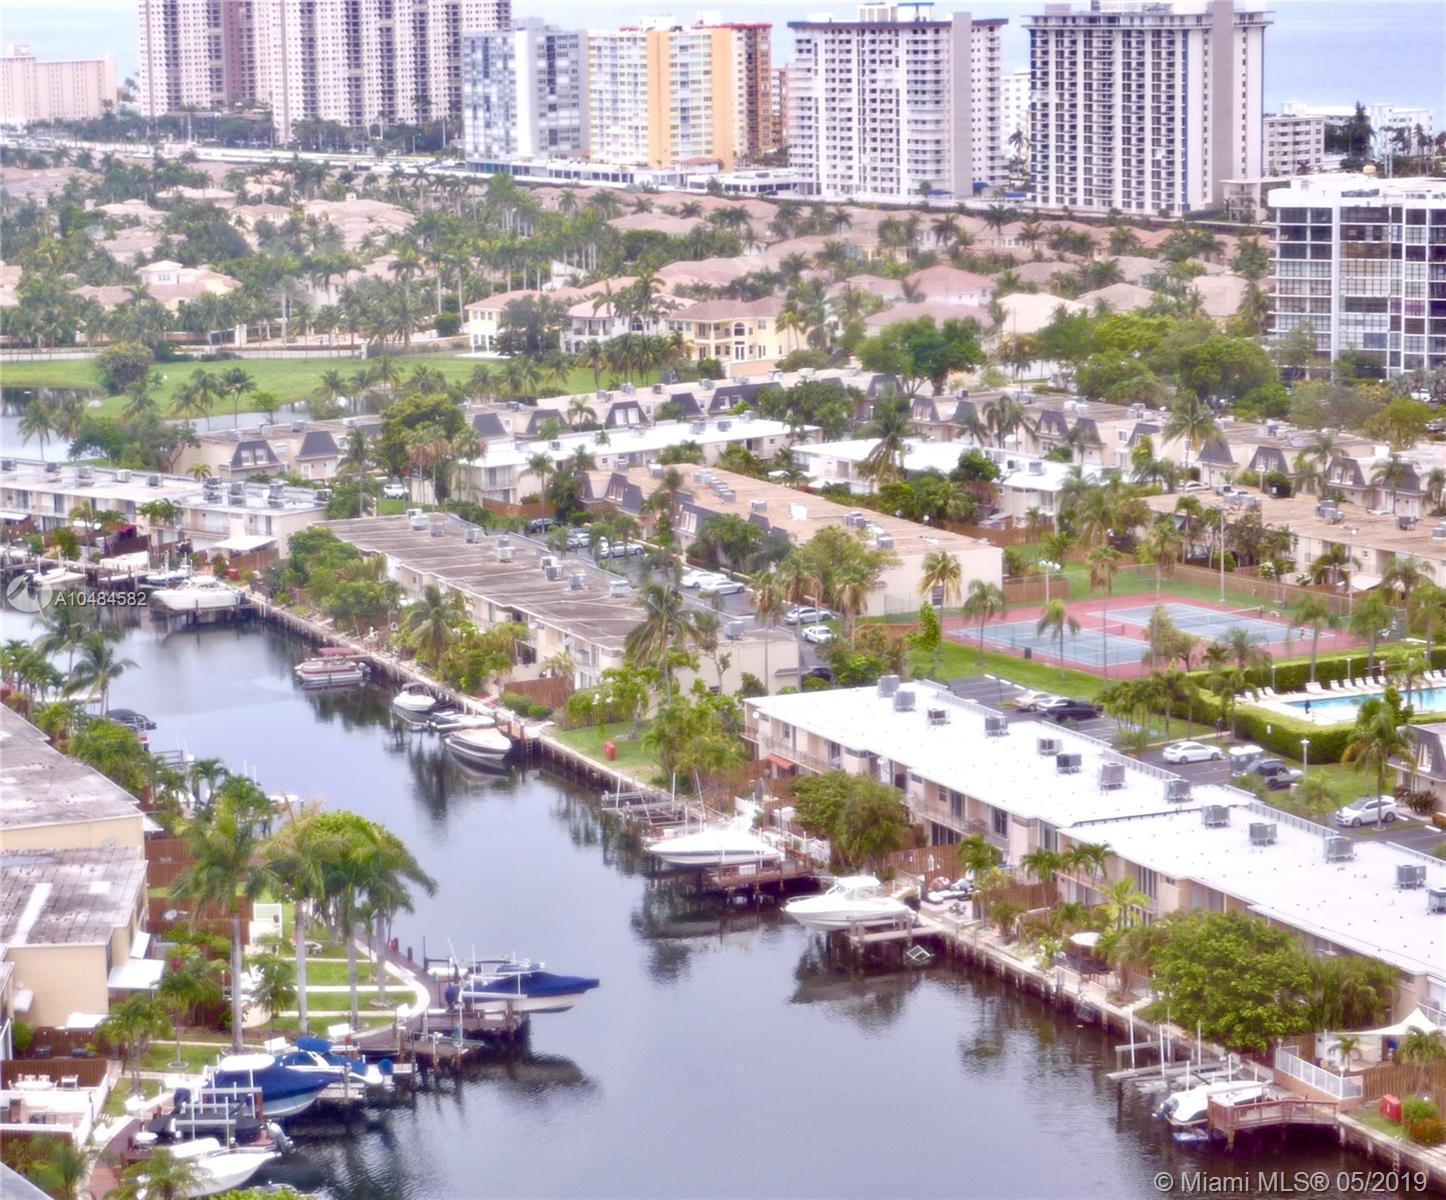 Olympus C #2512 - 2500 Parkview Dr #2512, Hallandale Beach, FL 33009